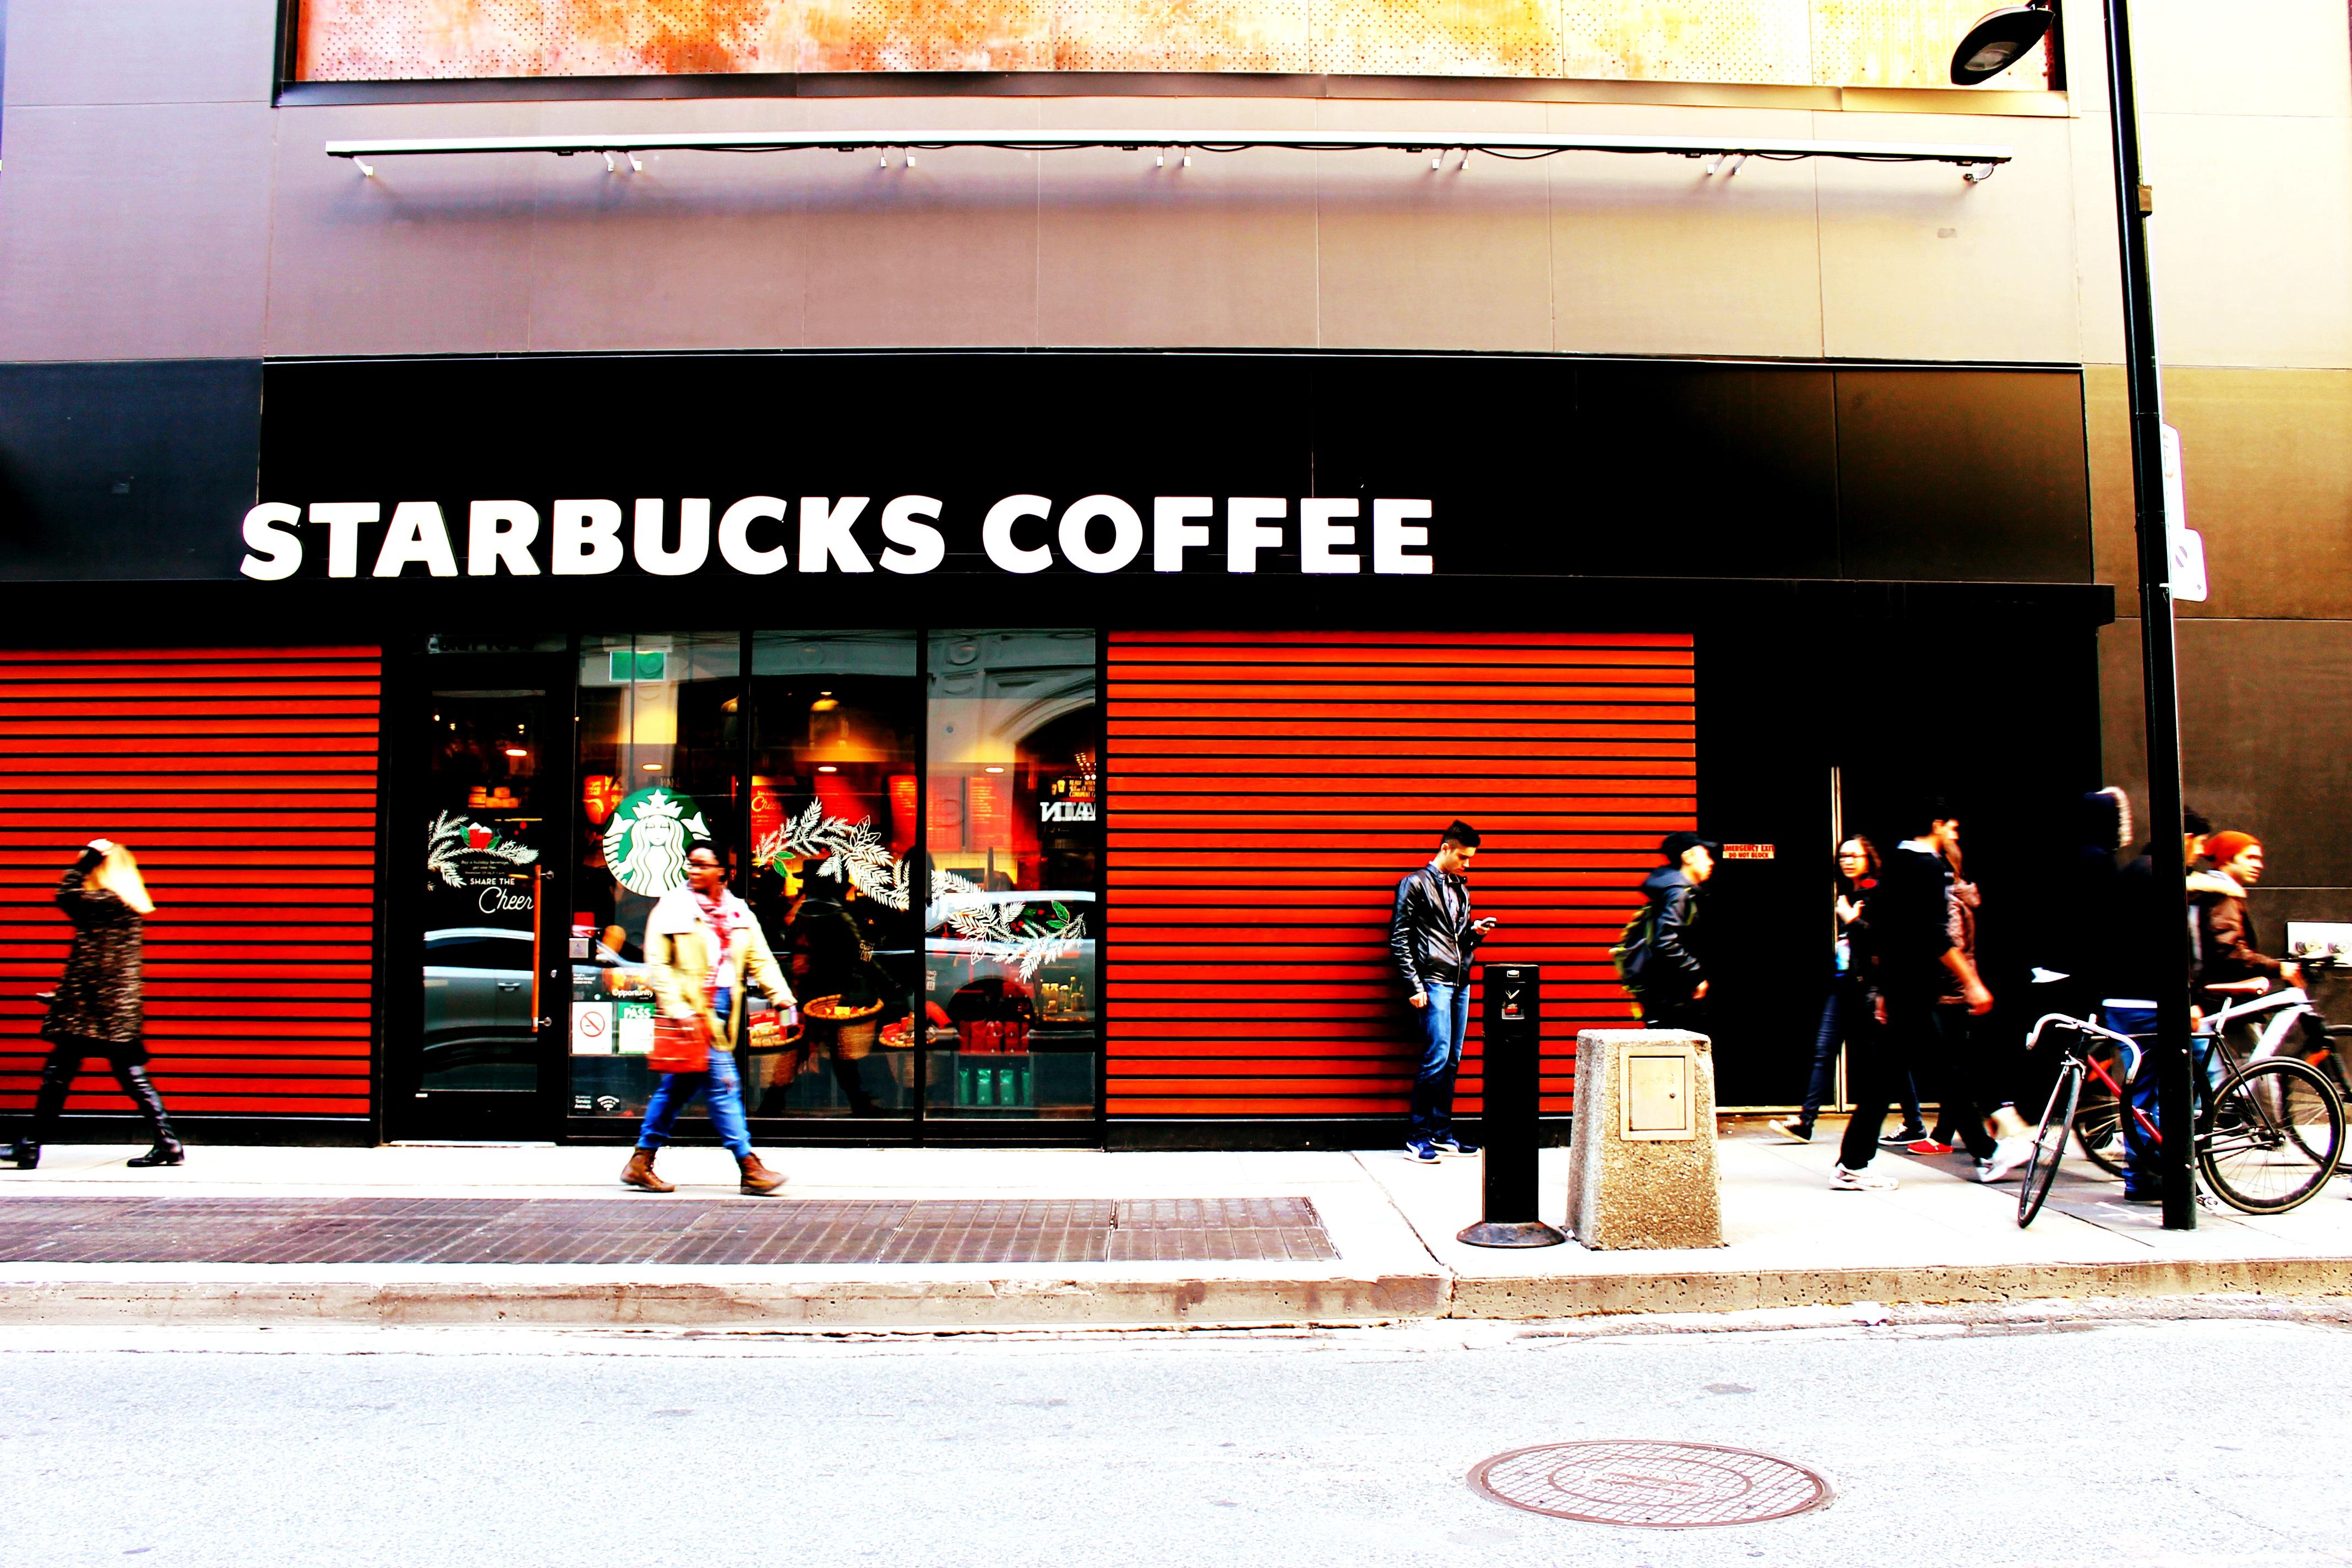 Starbucks Announce MyStarbucks and Alexa Changes